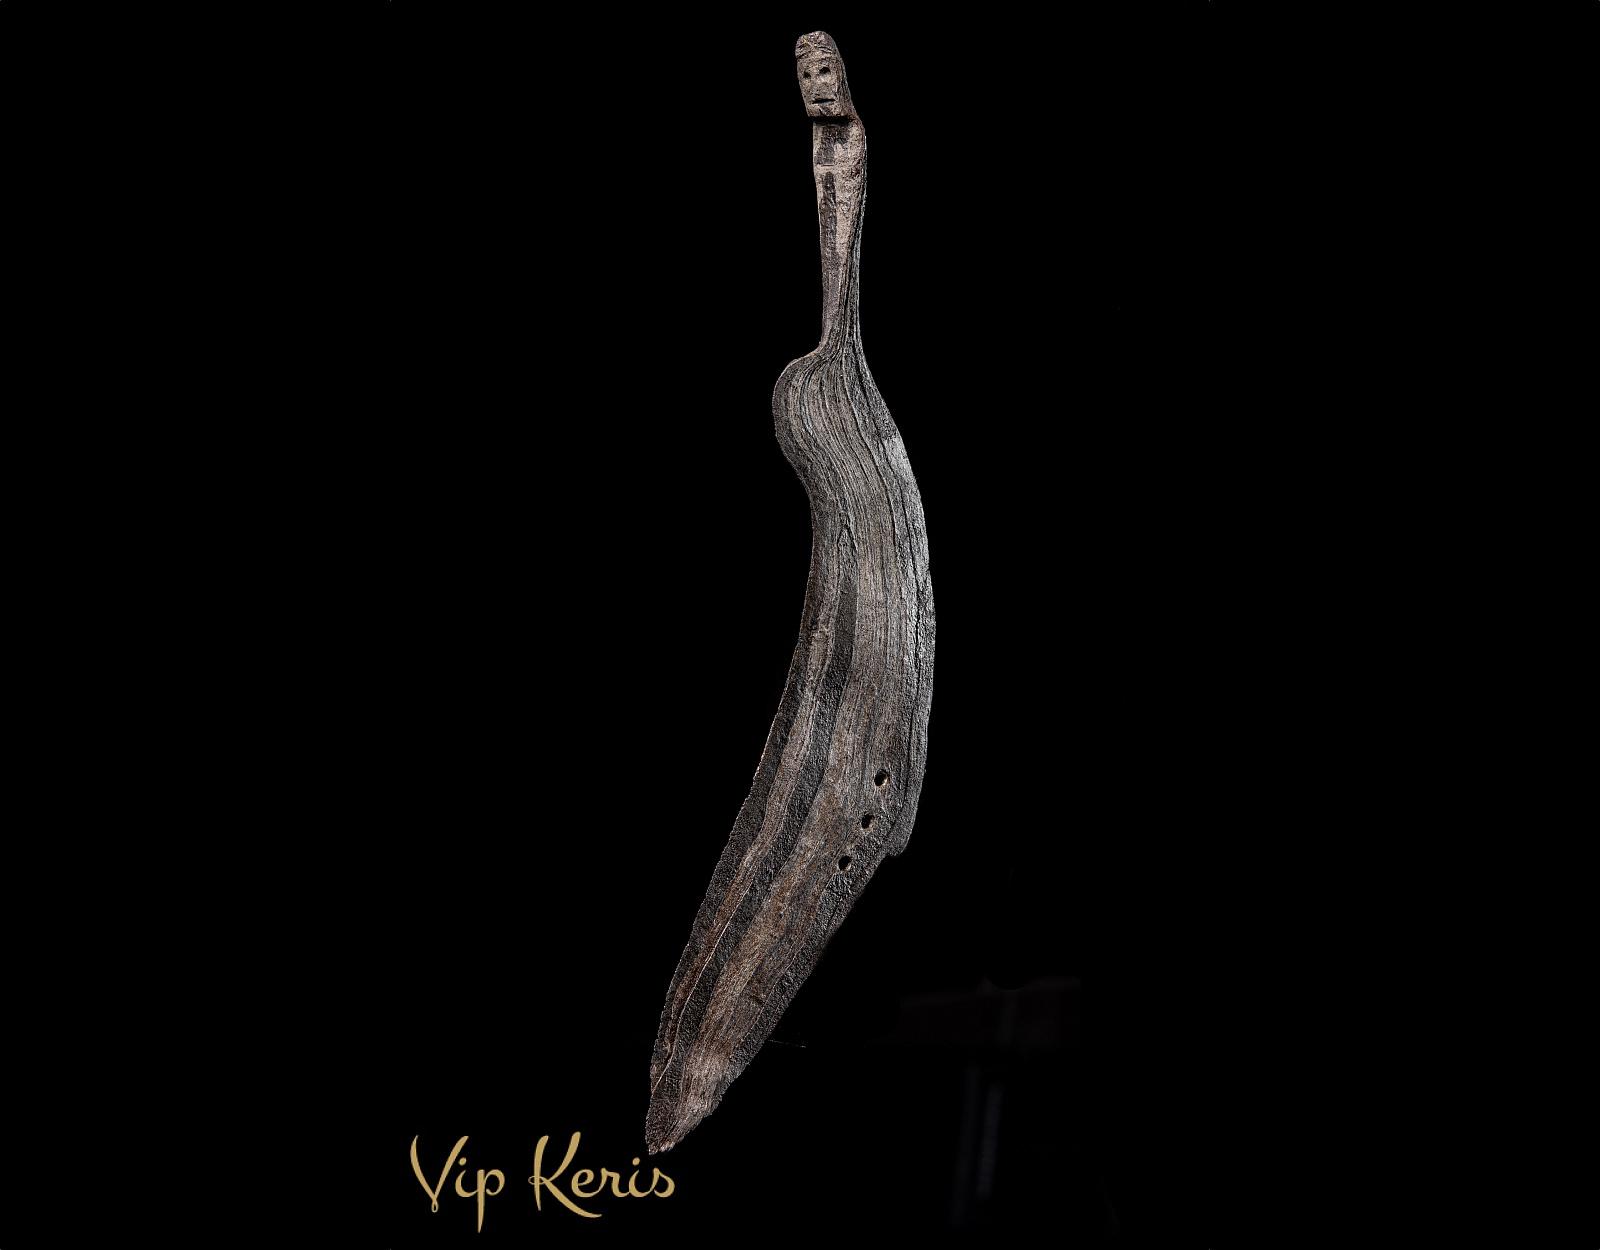 Кинжал Крис Sajen Kudi фото VipKeris